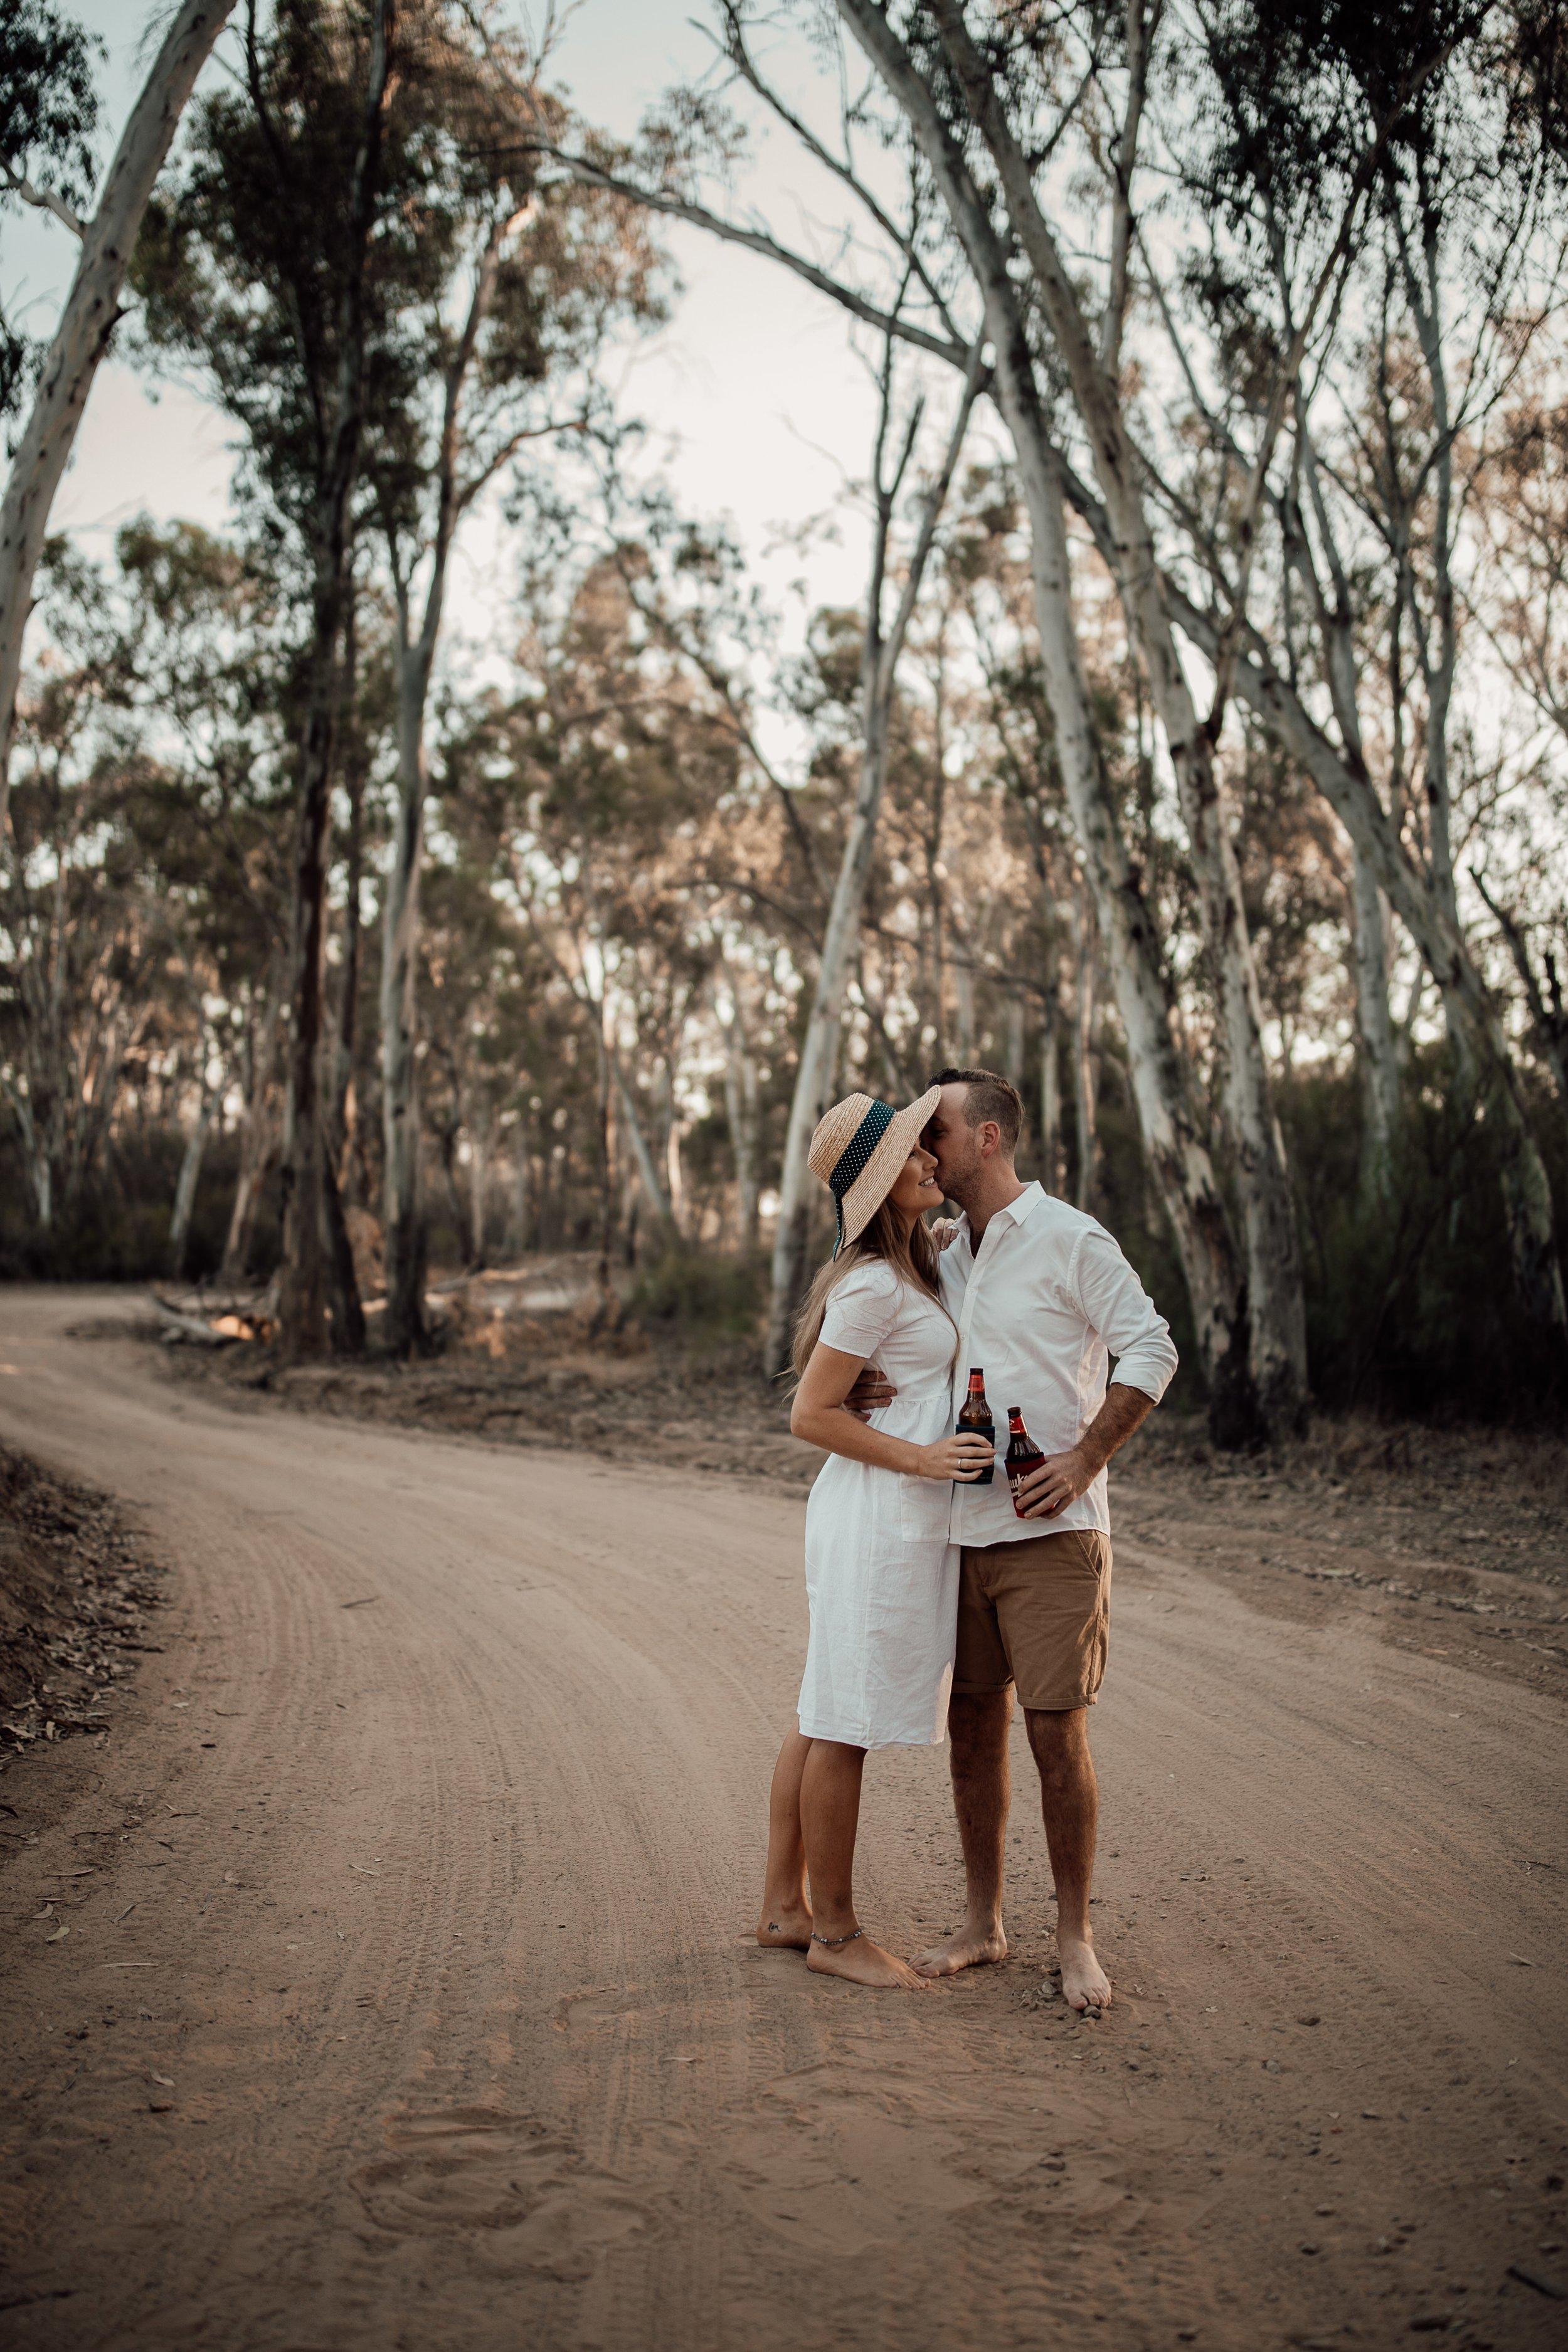 mickalathomas_puremacphotography_weddingphotographer_couplephotographer_Sheppartonphotographer_2860.jpg